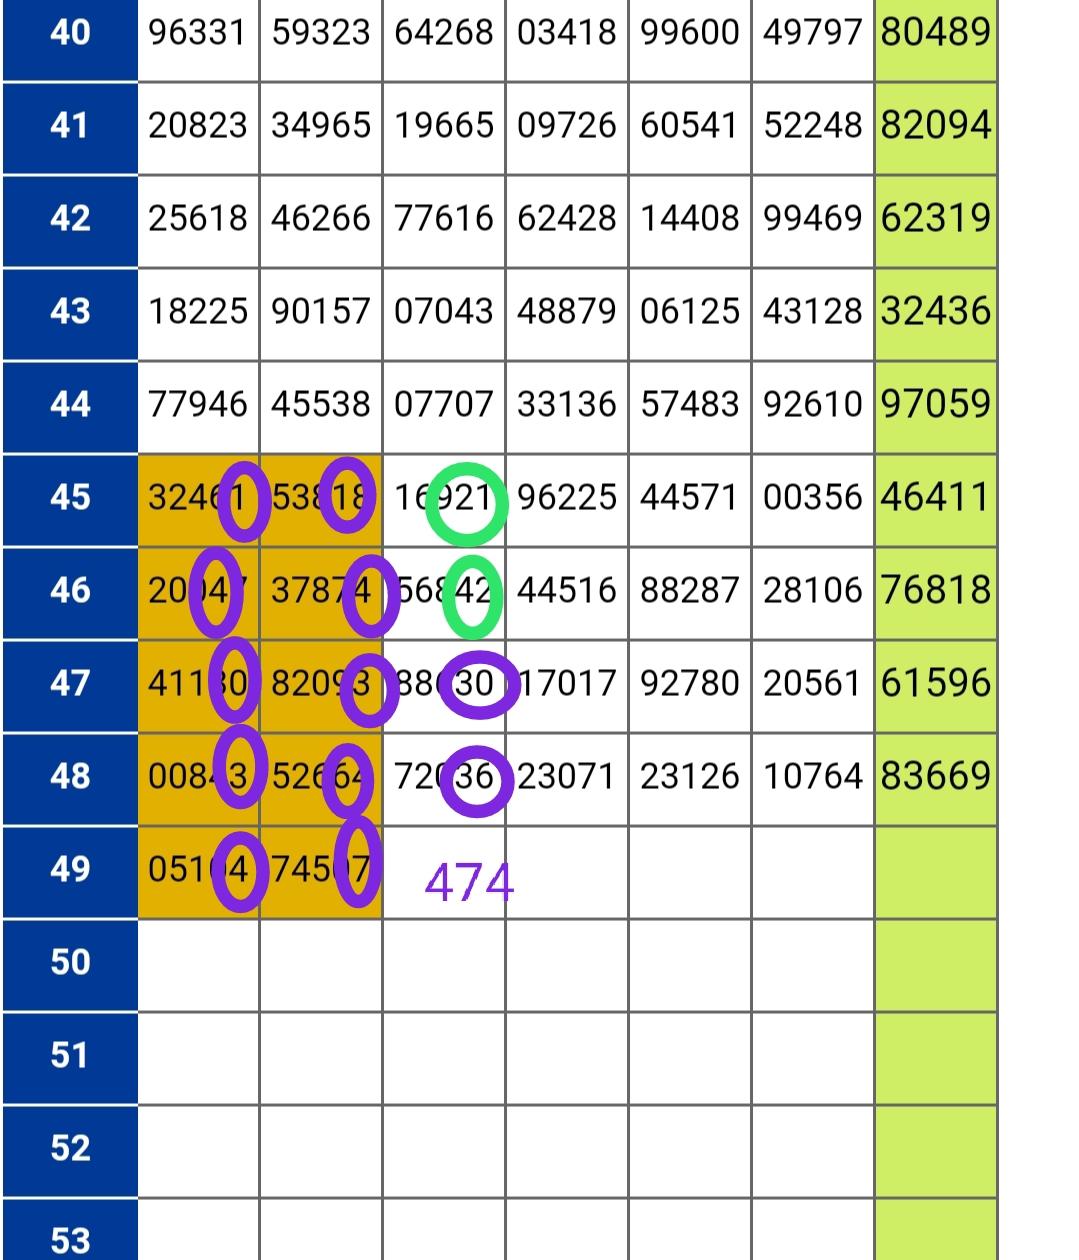 IMG_20201202_065431.jpg